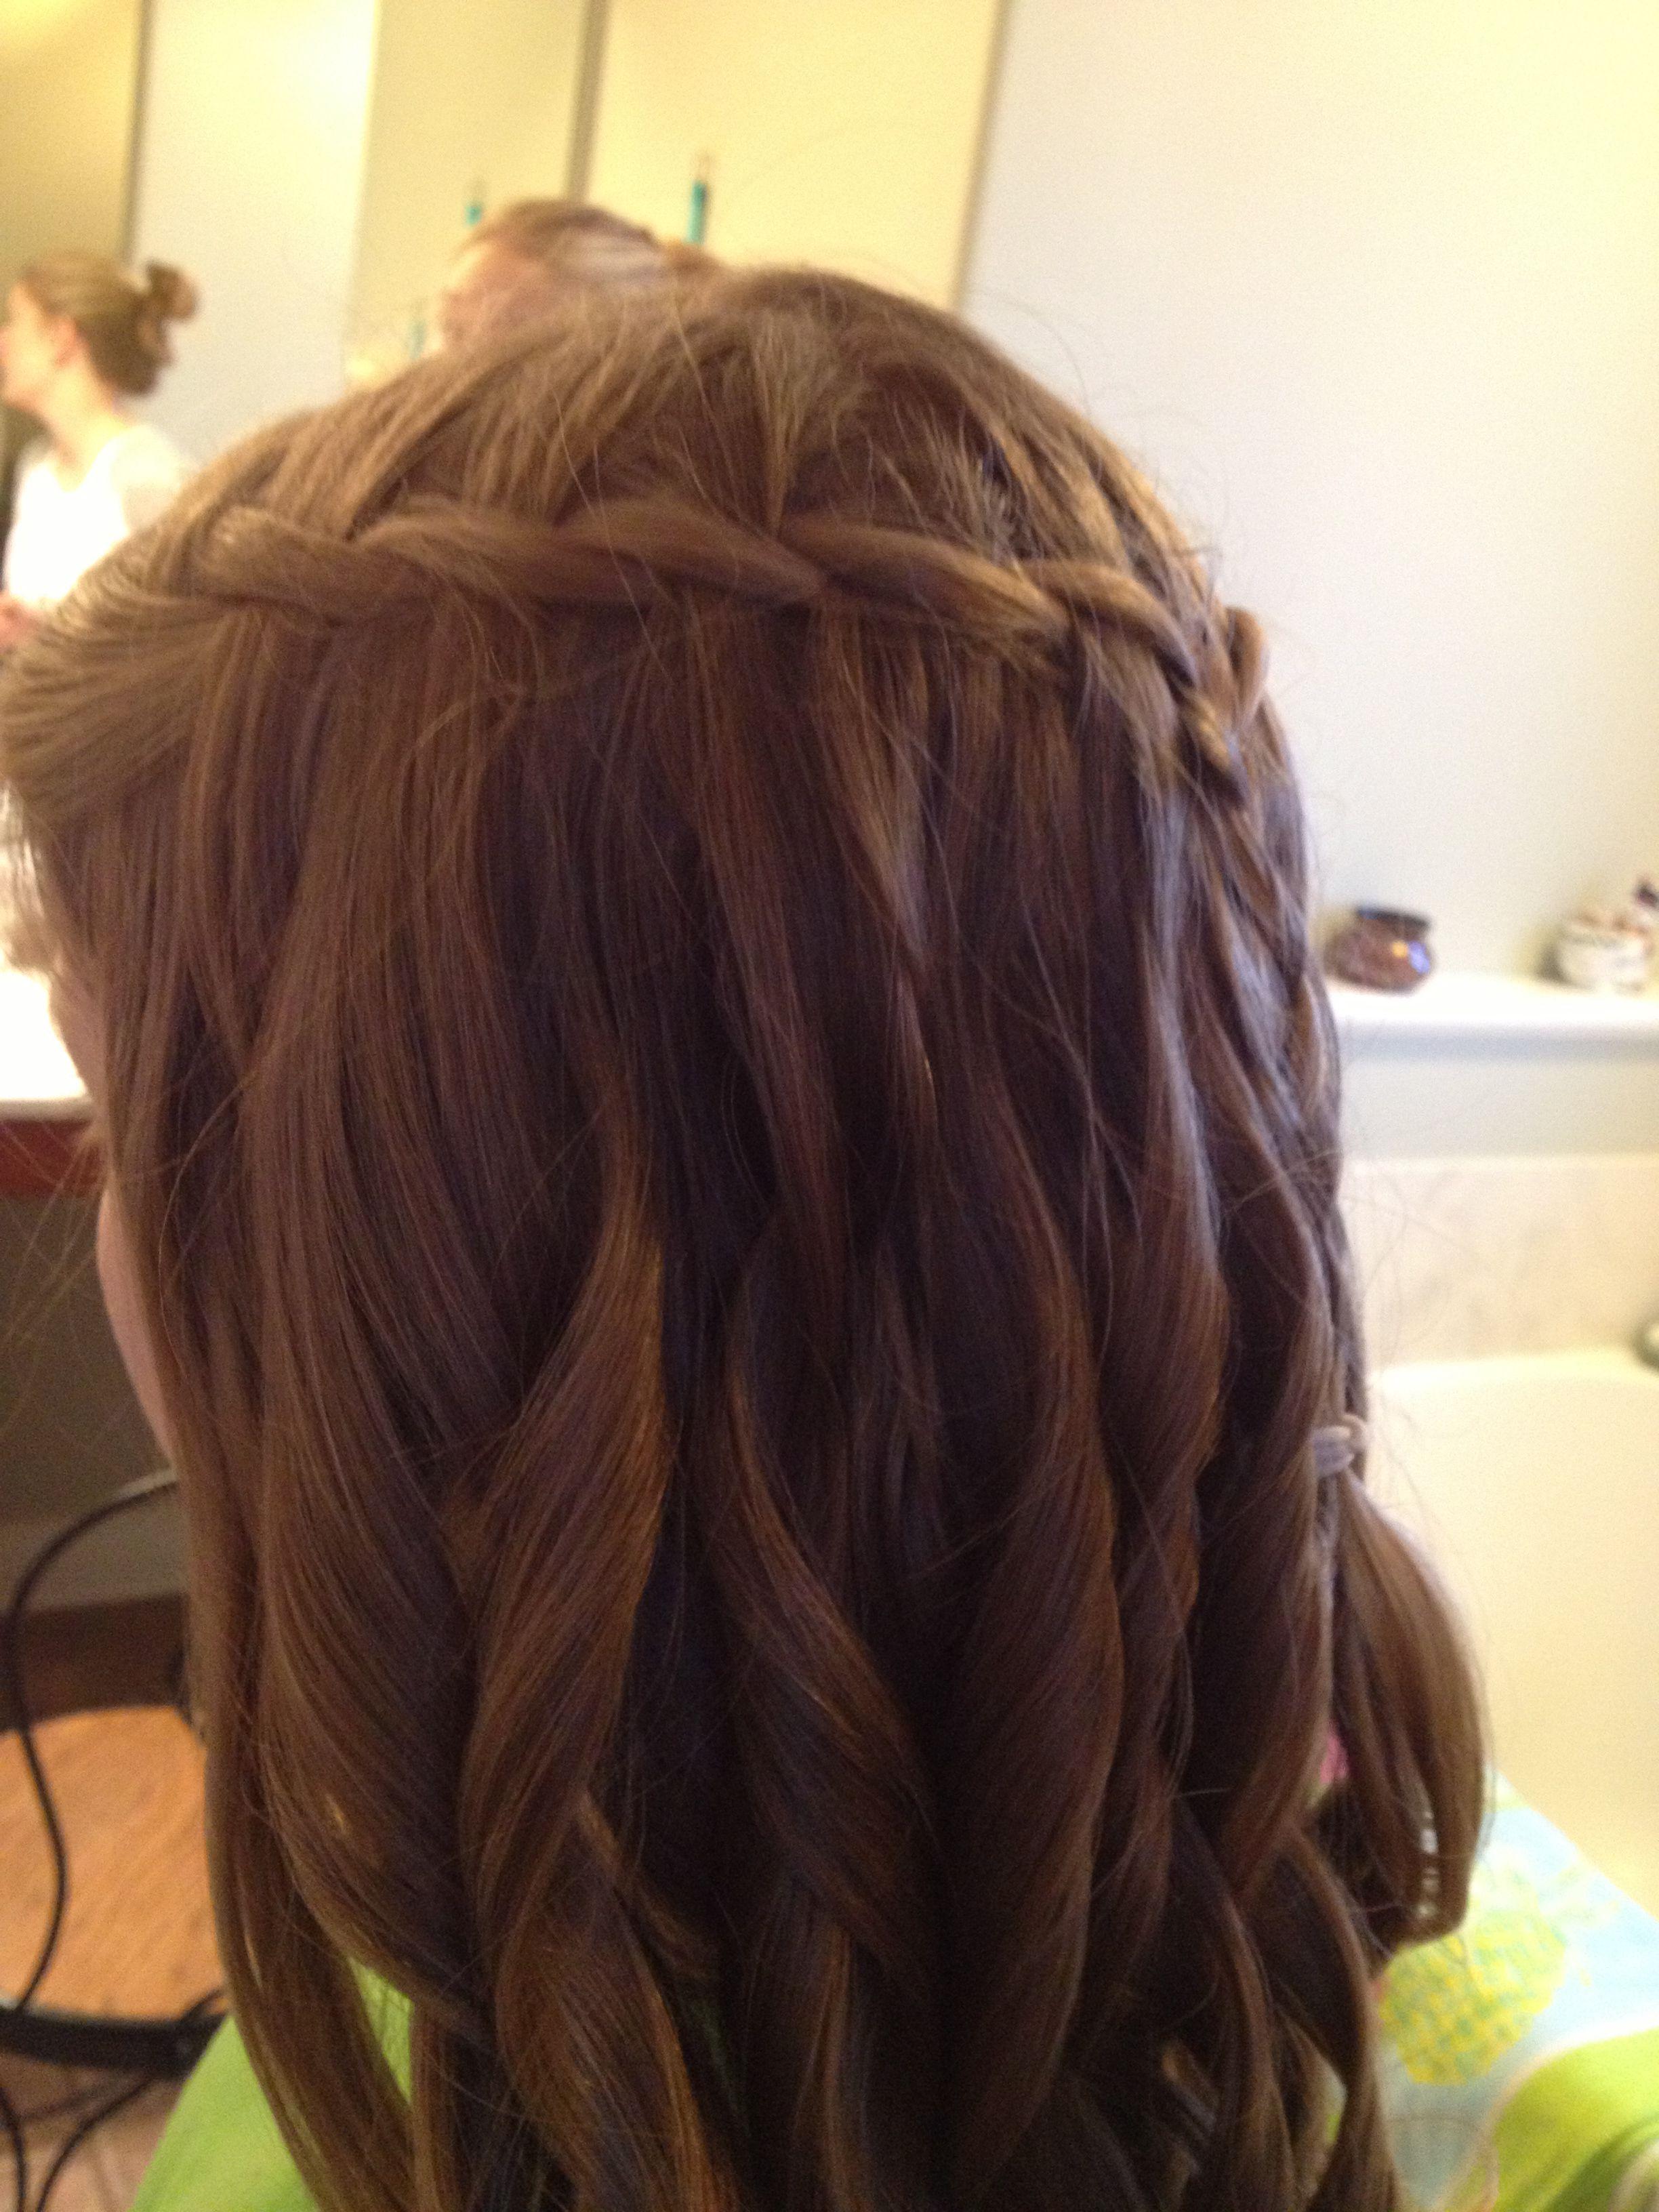 Waterfall Braid Before Middle School Dance Cute Hair